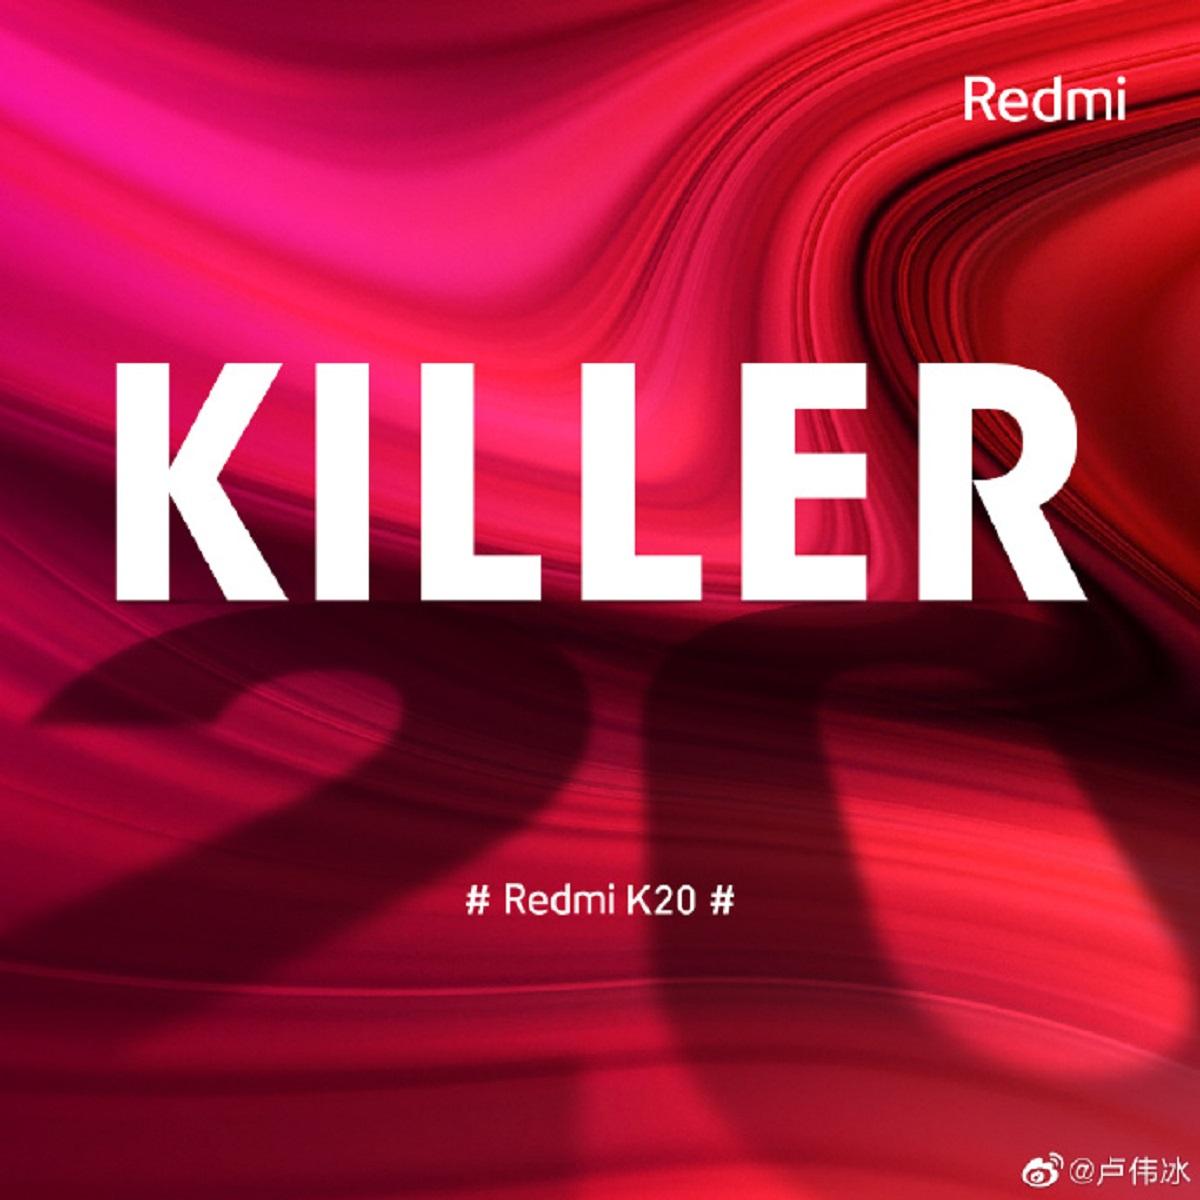 Xiaomi : le smartphone haut de gamme de Redmi s'appellera K20 pour « flagship killer